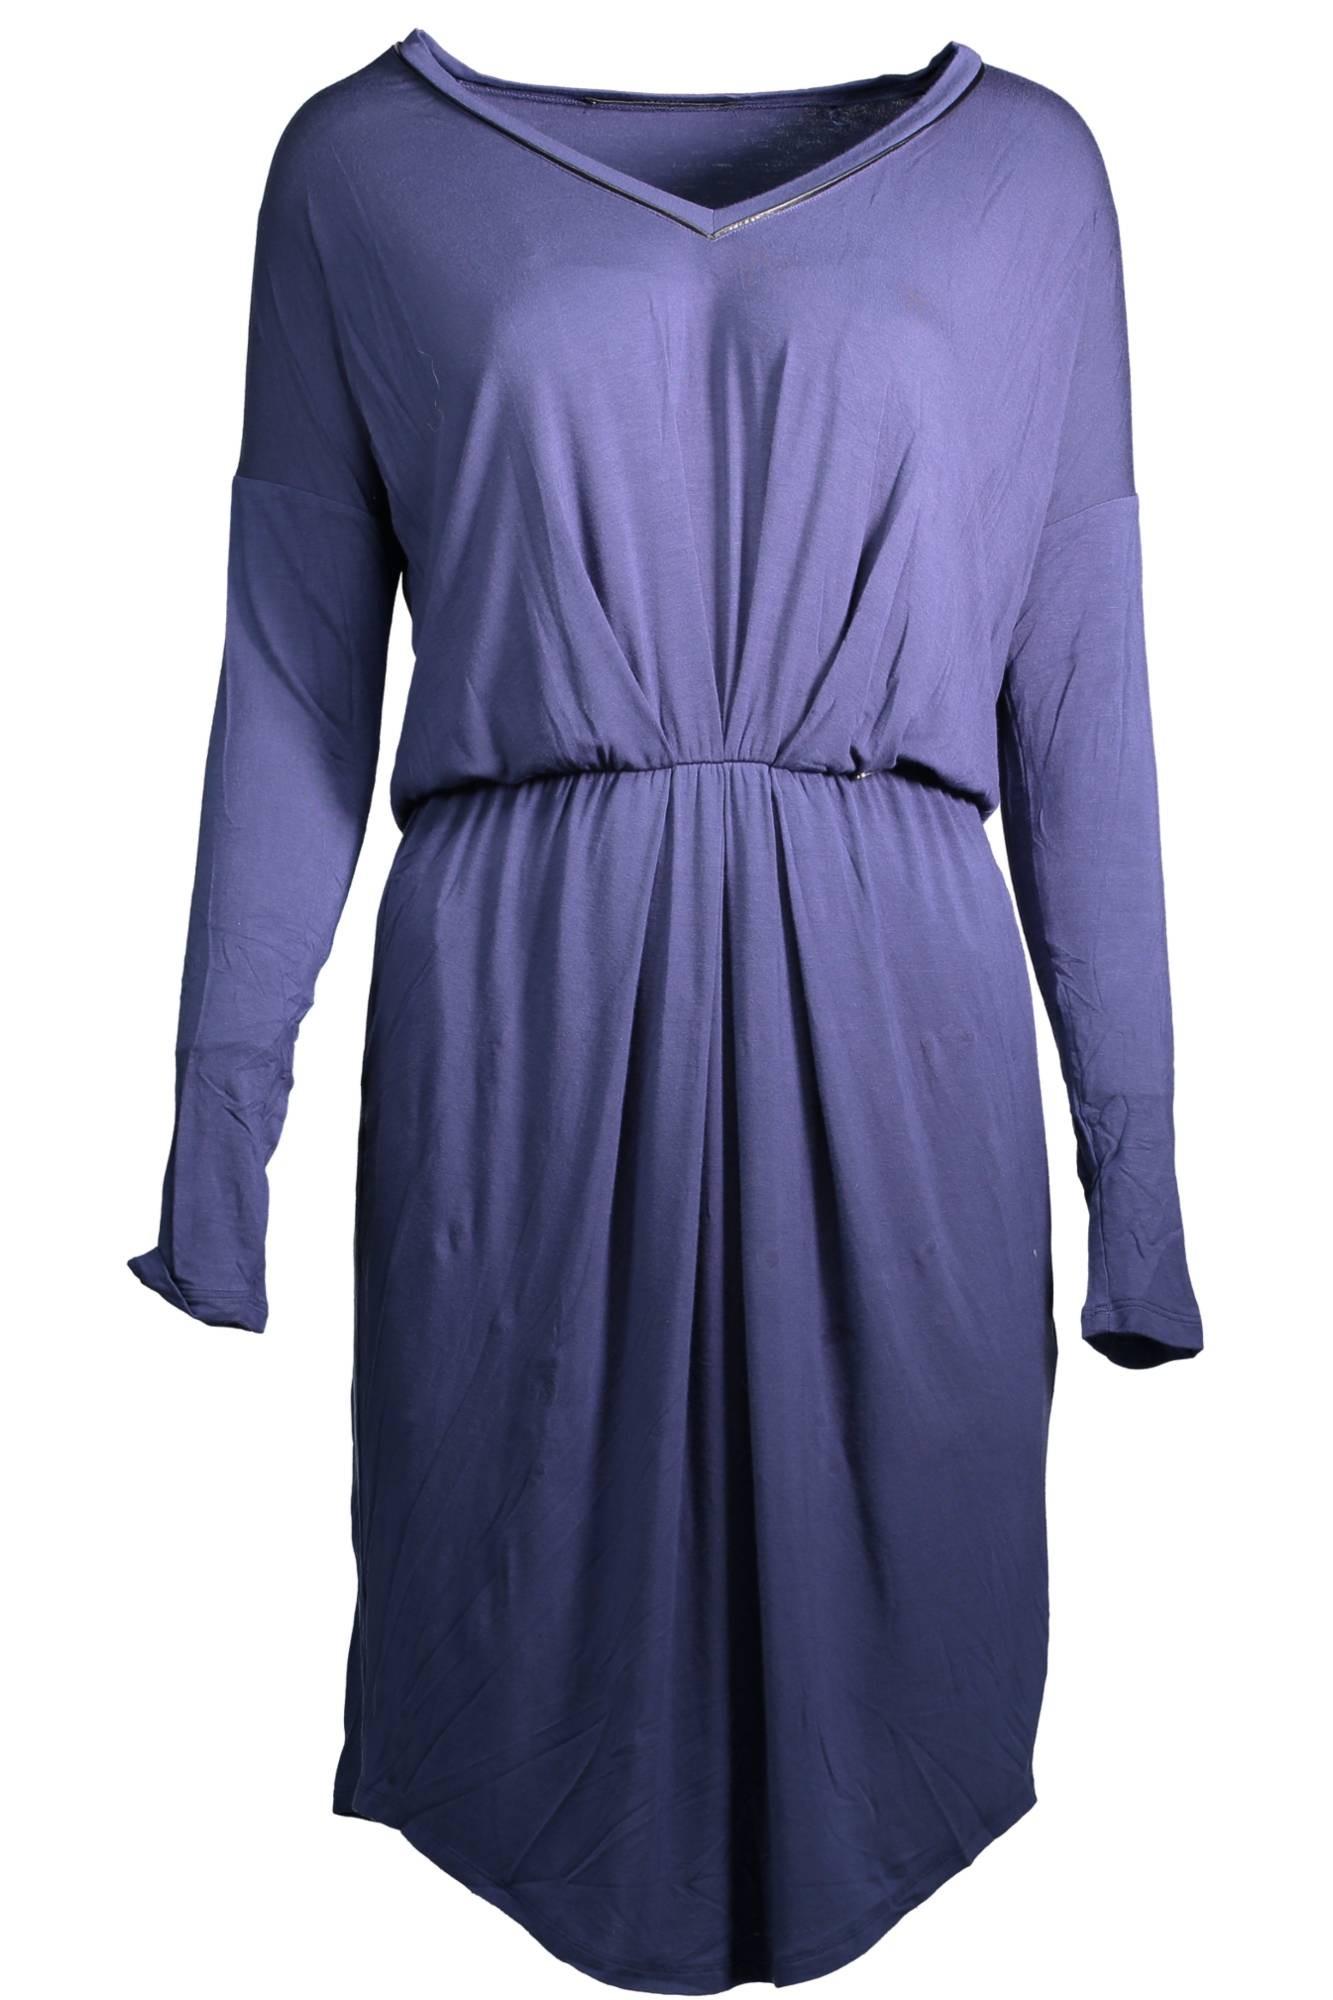 Guess jeans Dámské šaty Woman Dress Modrá - Glami.cz bd7ff332672